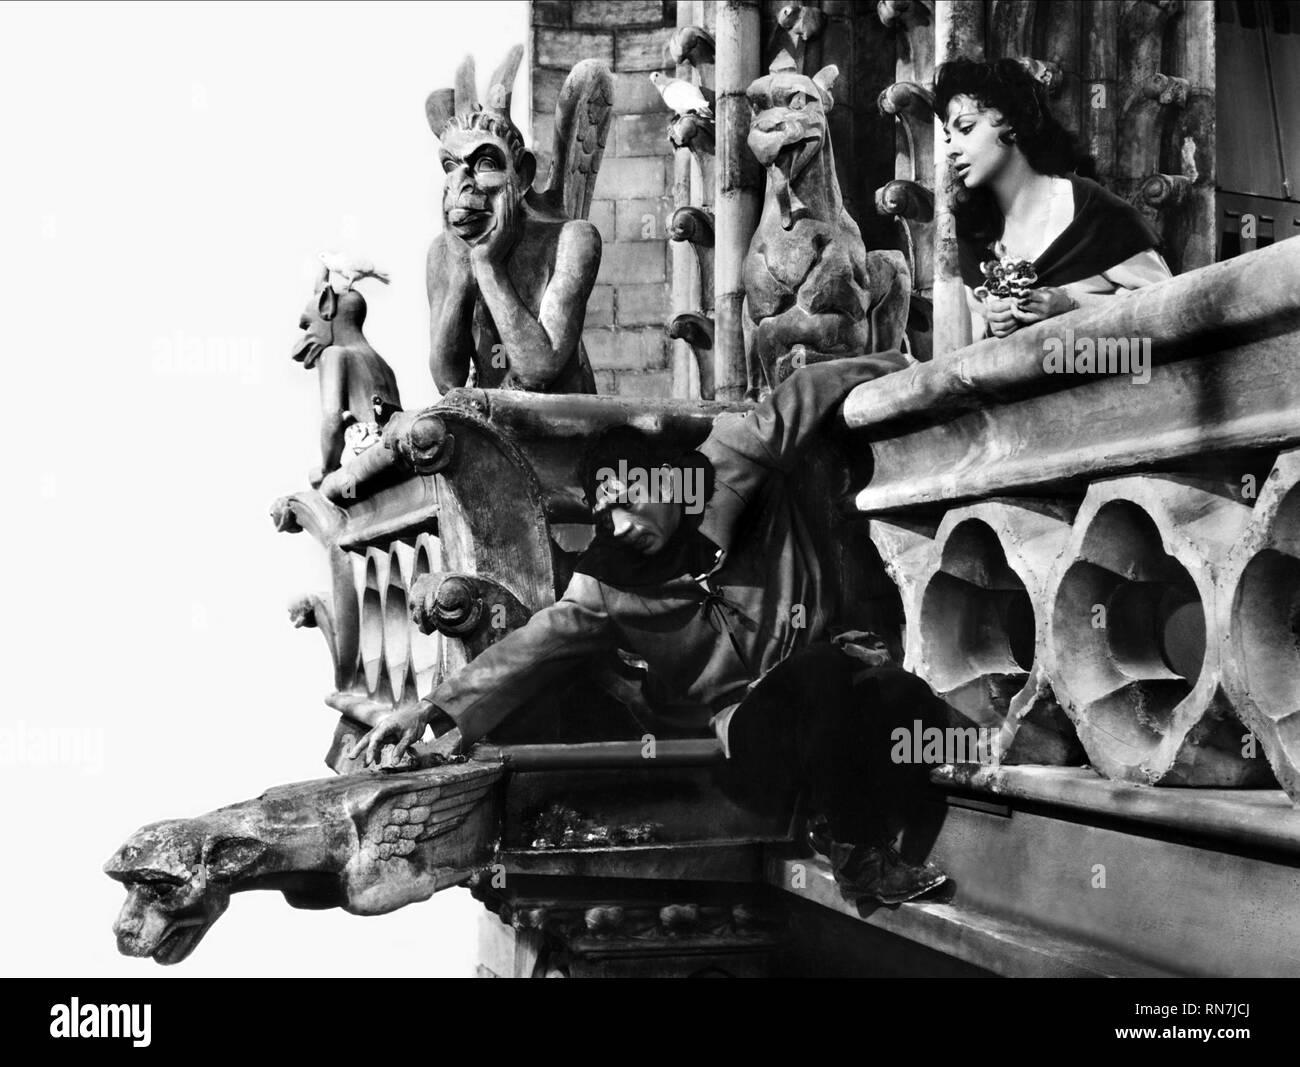 QUINN,LOLLOBRIGIDA, NOTRE DAME DE PARIS, 1956 Stock Photo